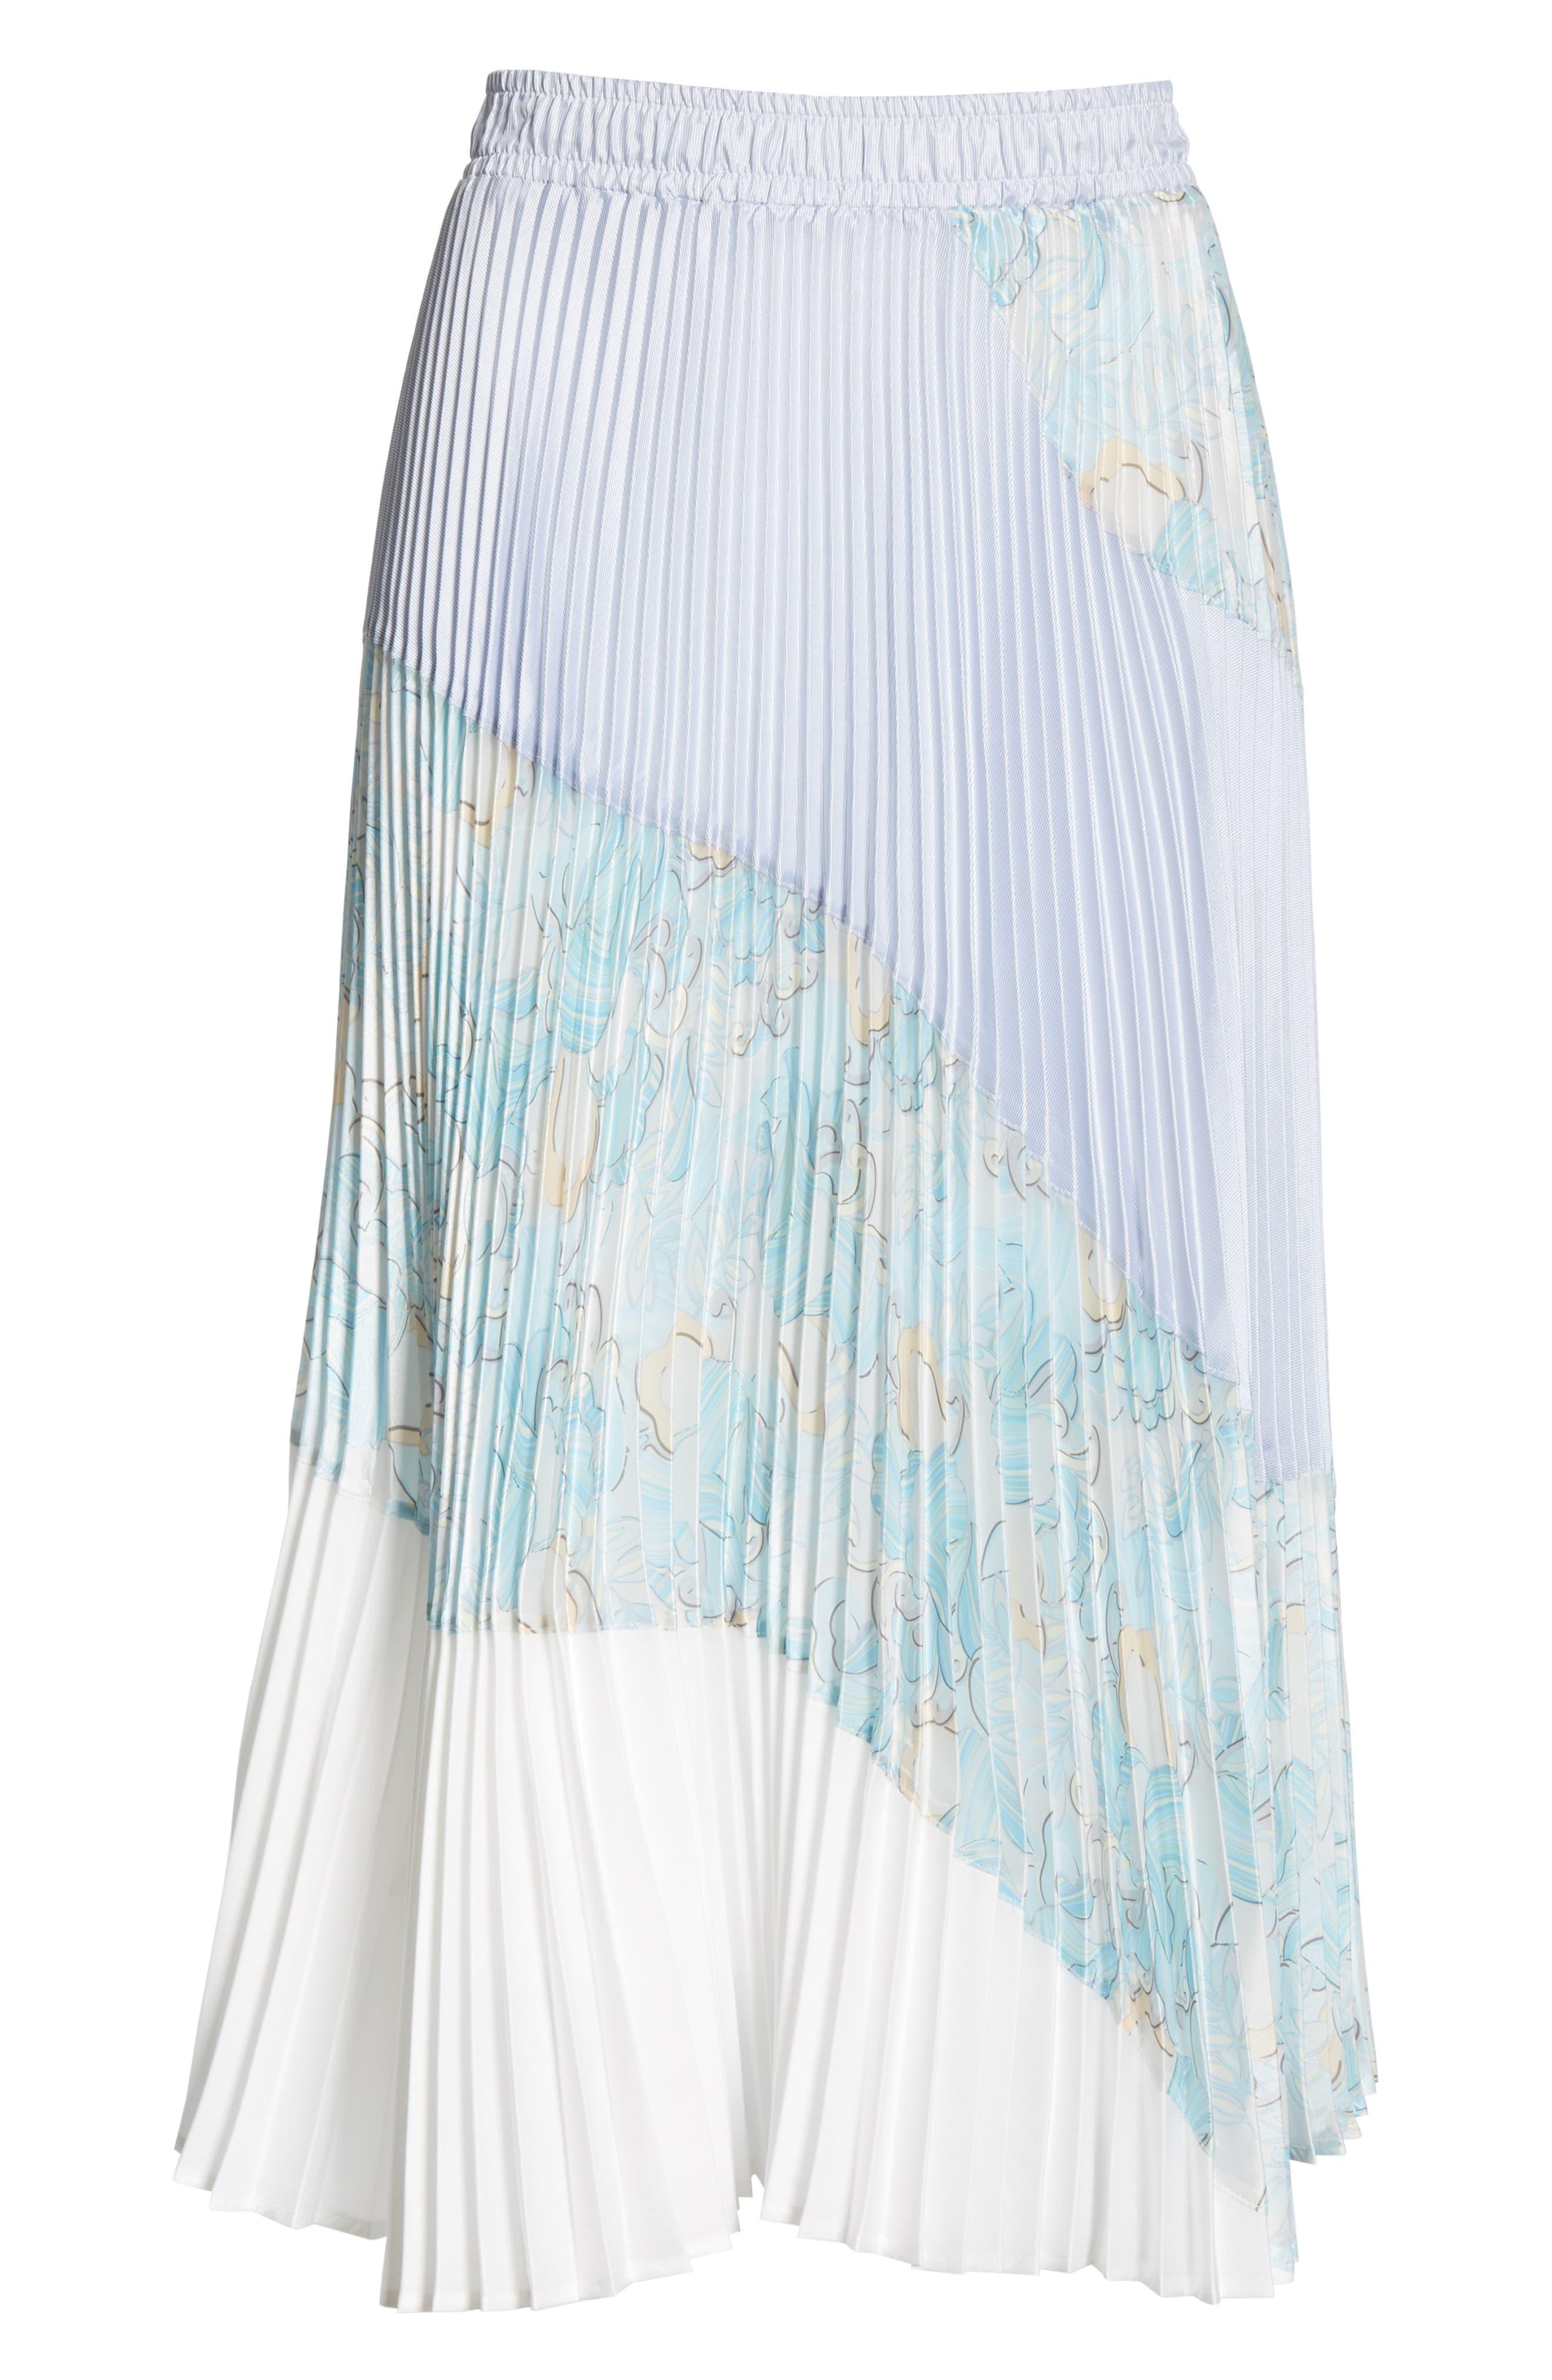 Floral Colorblock Pleated Skirt,                             Alternate thumbnail 6, color,                             BLUE